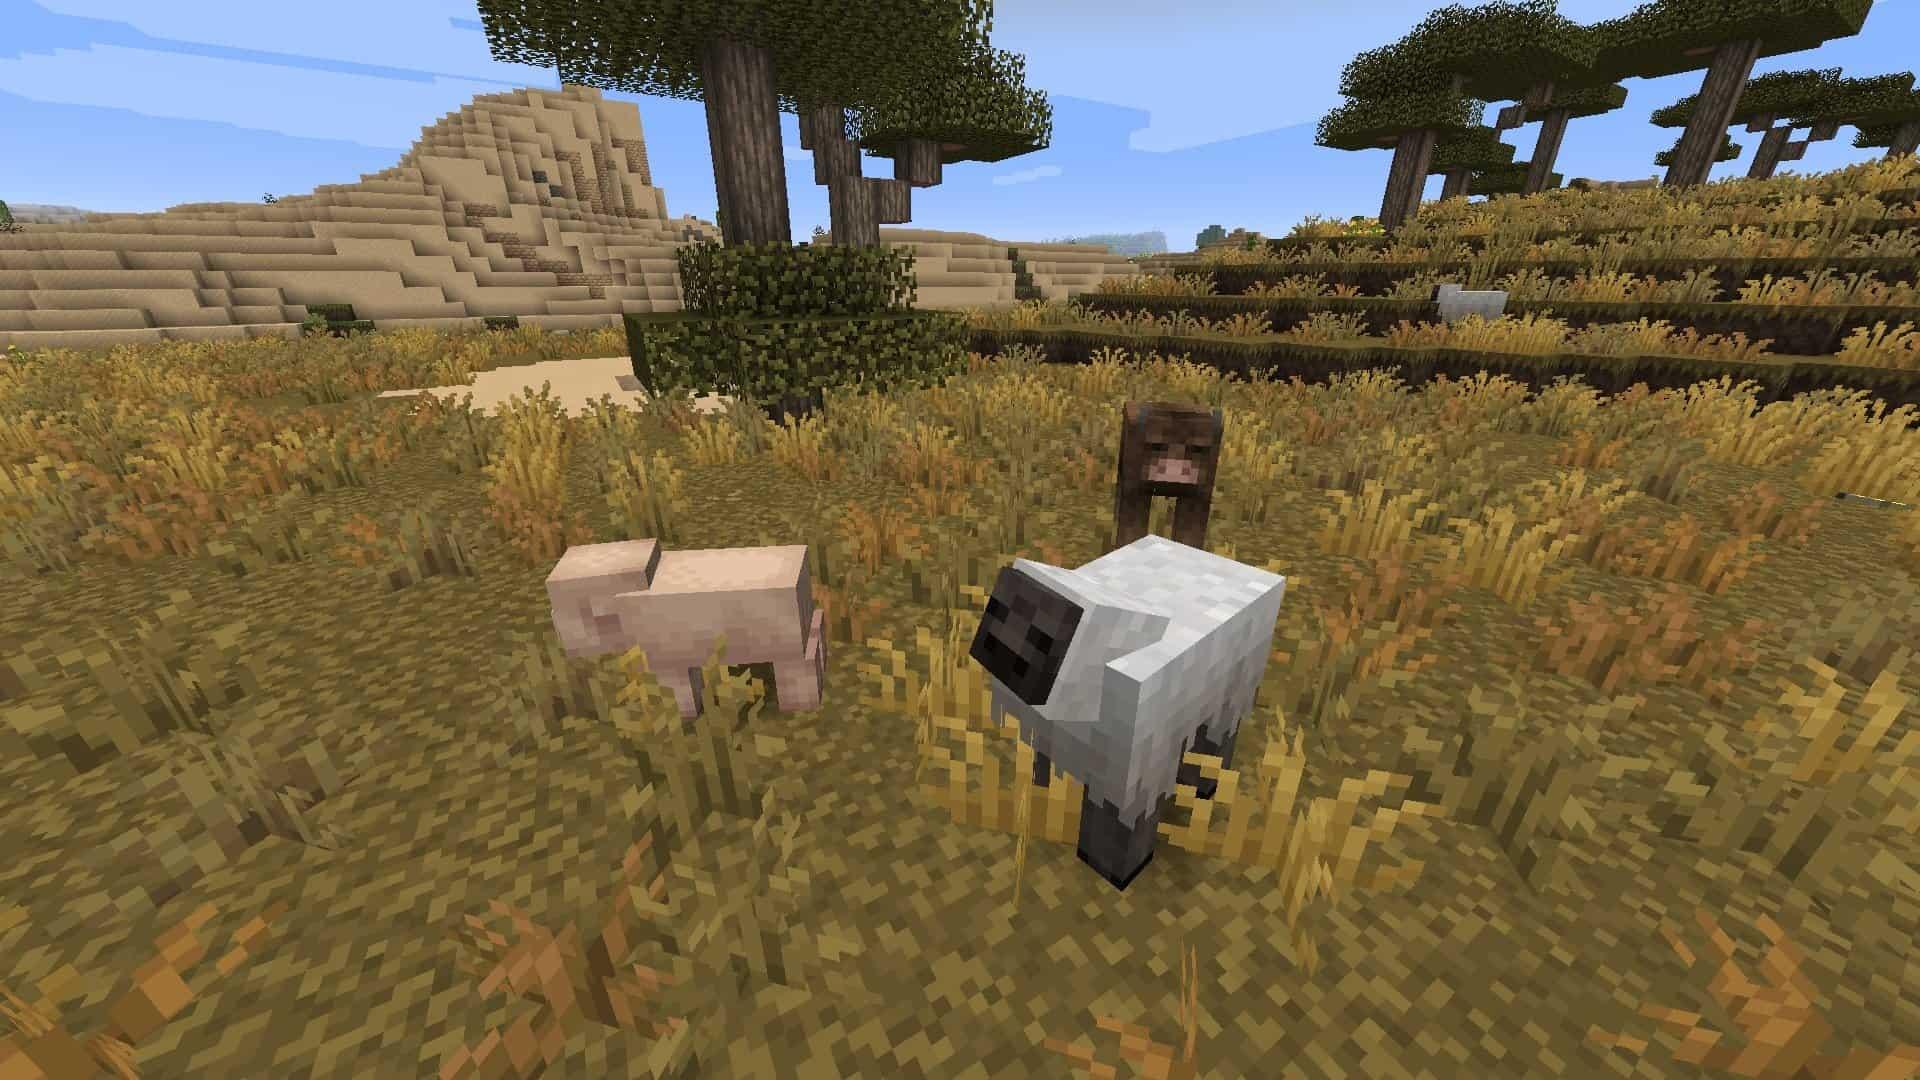 animaux avec le resource pack Excalibur